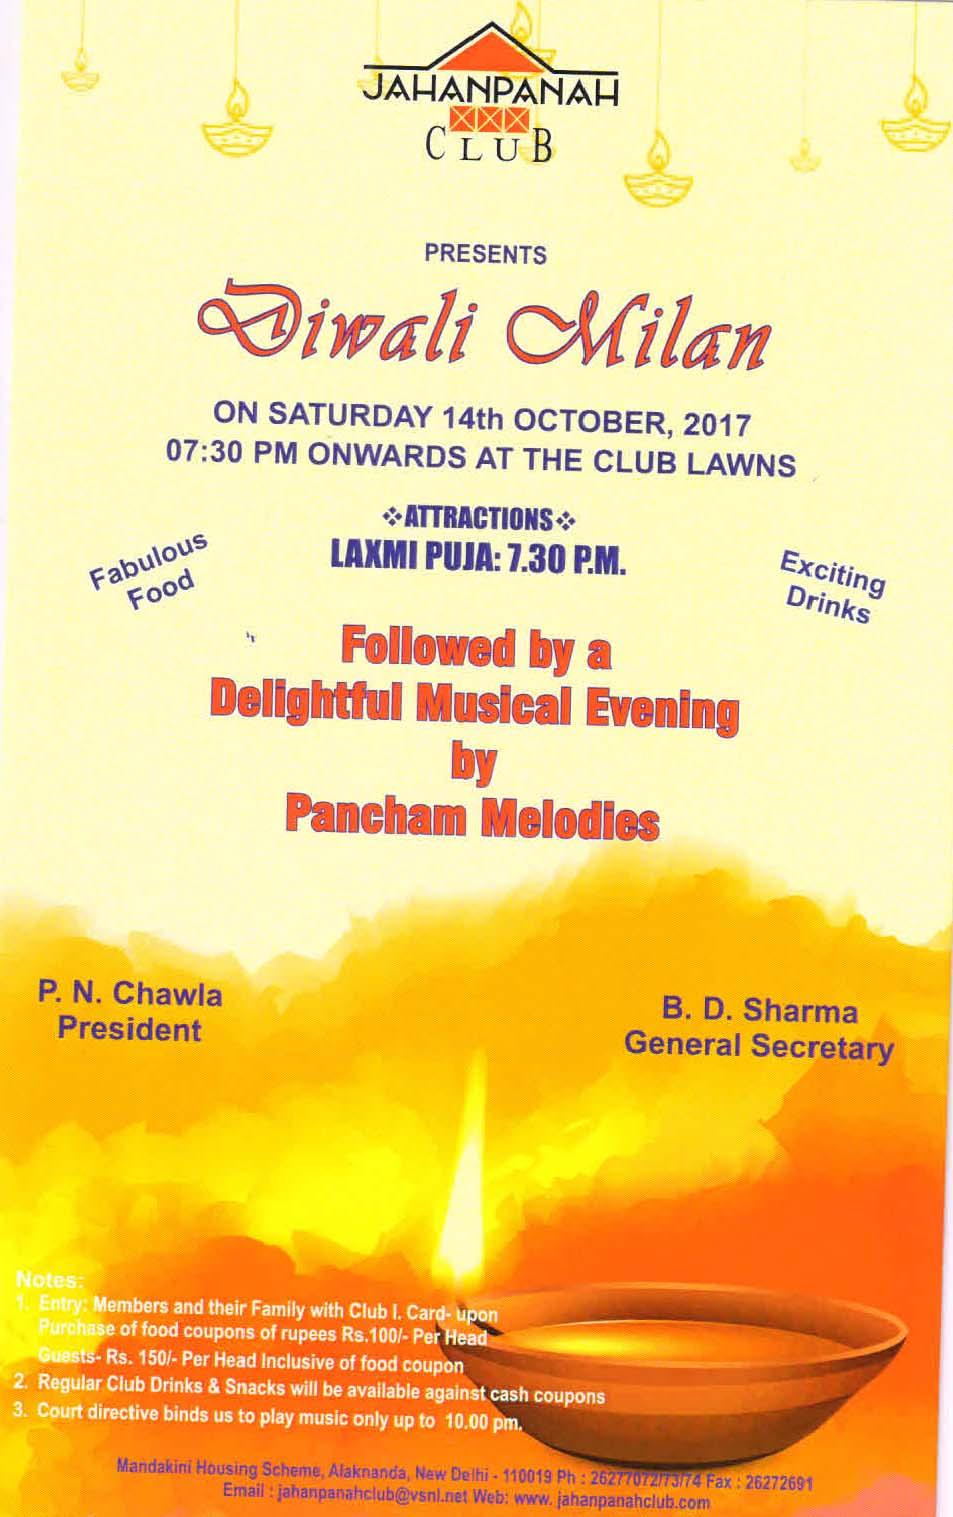 Index of invitation diwali milan invitationg stopboris Gallery